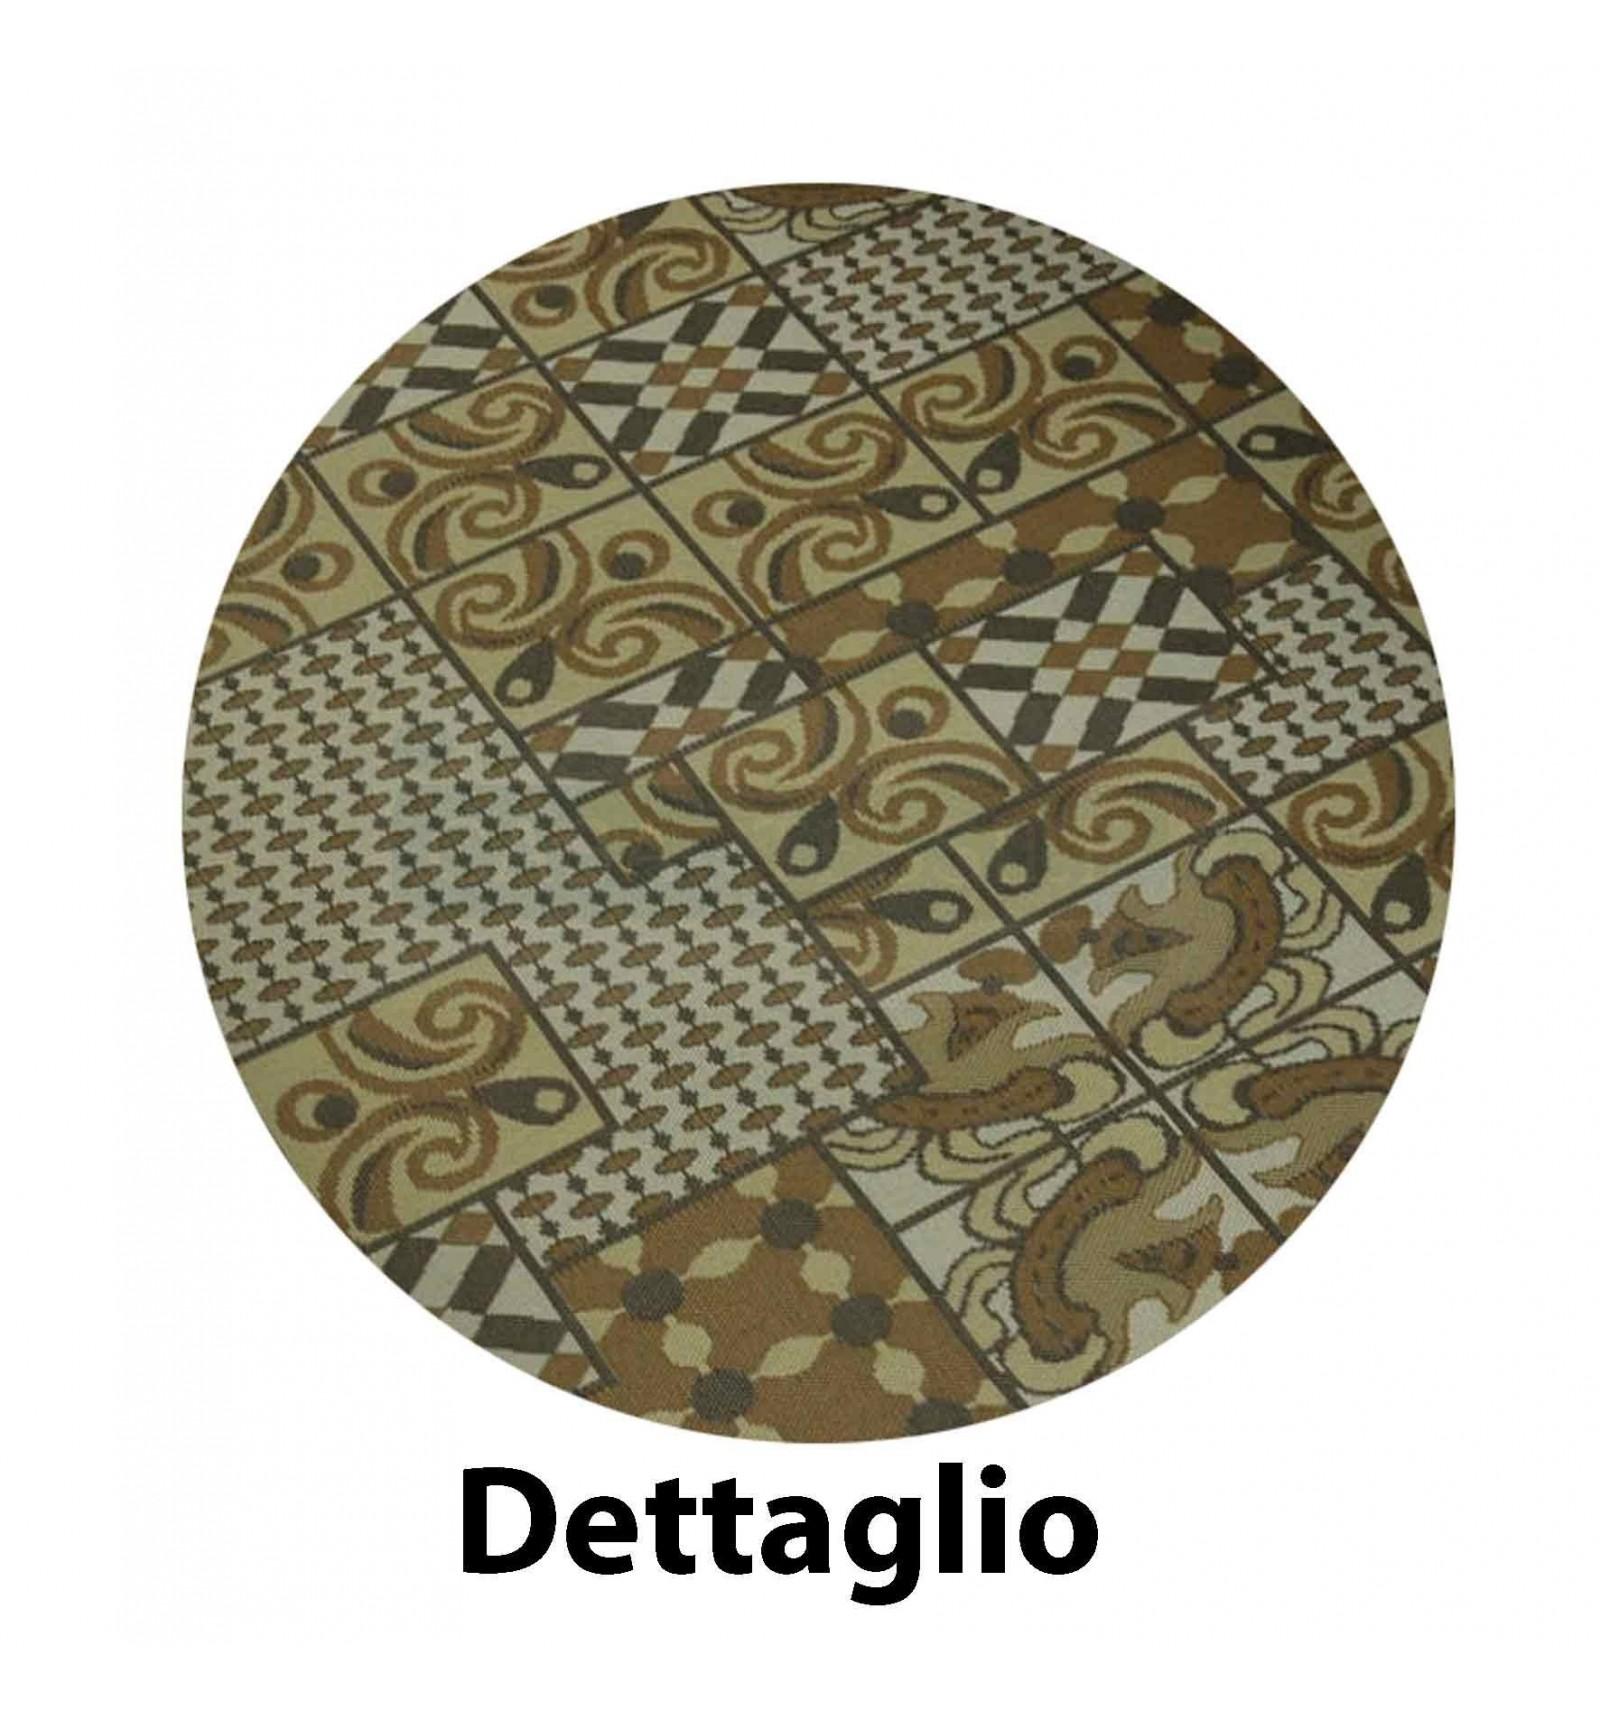 Maiolica-liscio-tappeto-passatoia-varie-misure miniatura 10